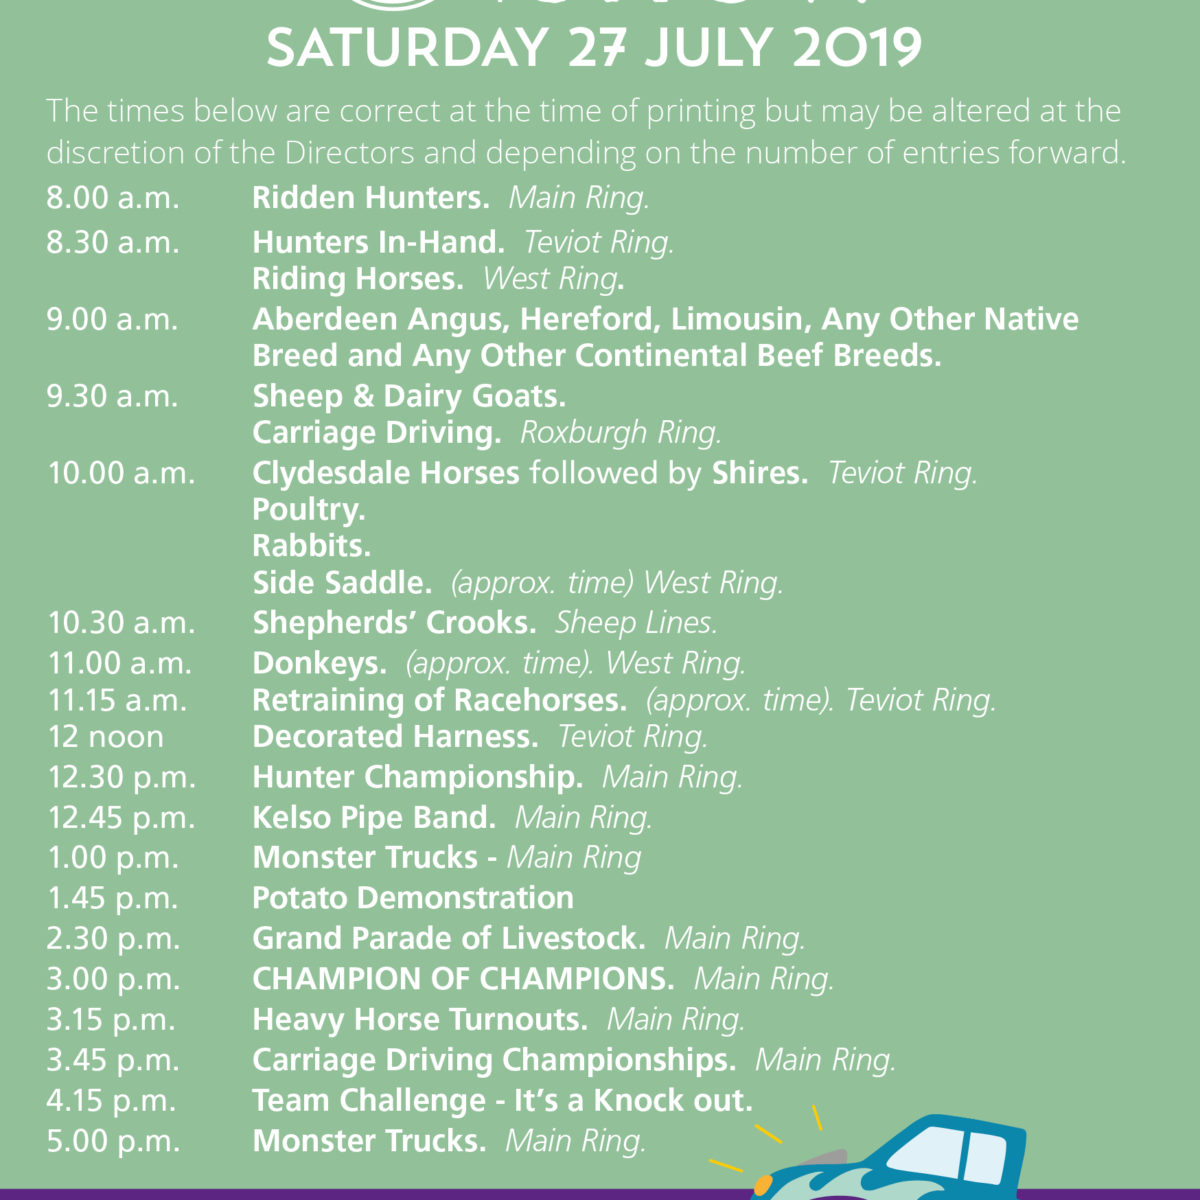 Saturday 2019 Programme